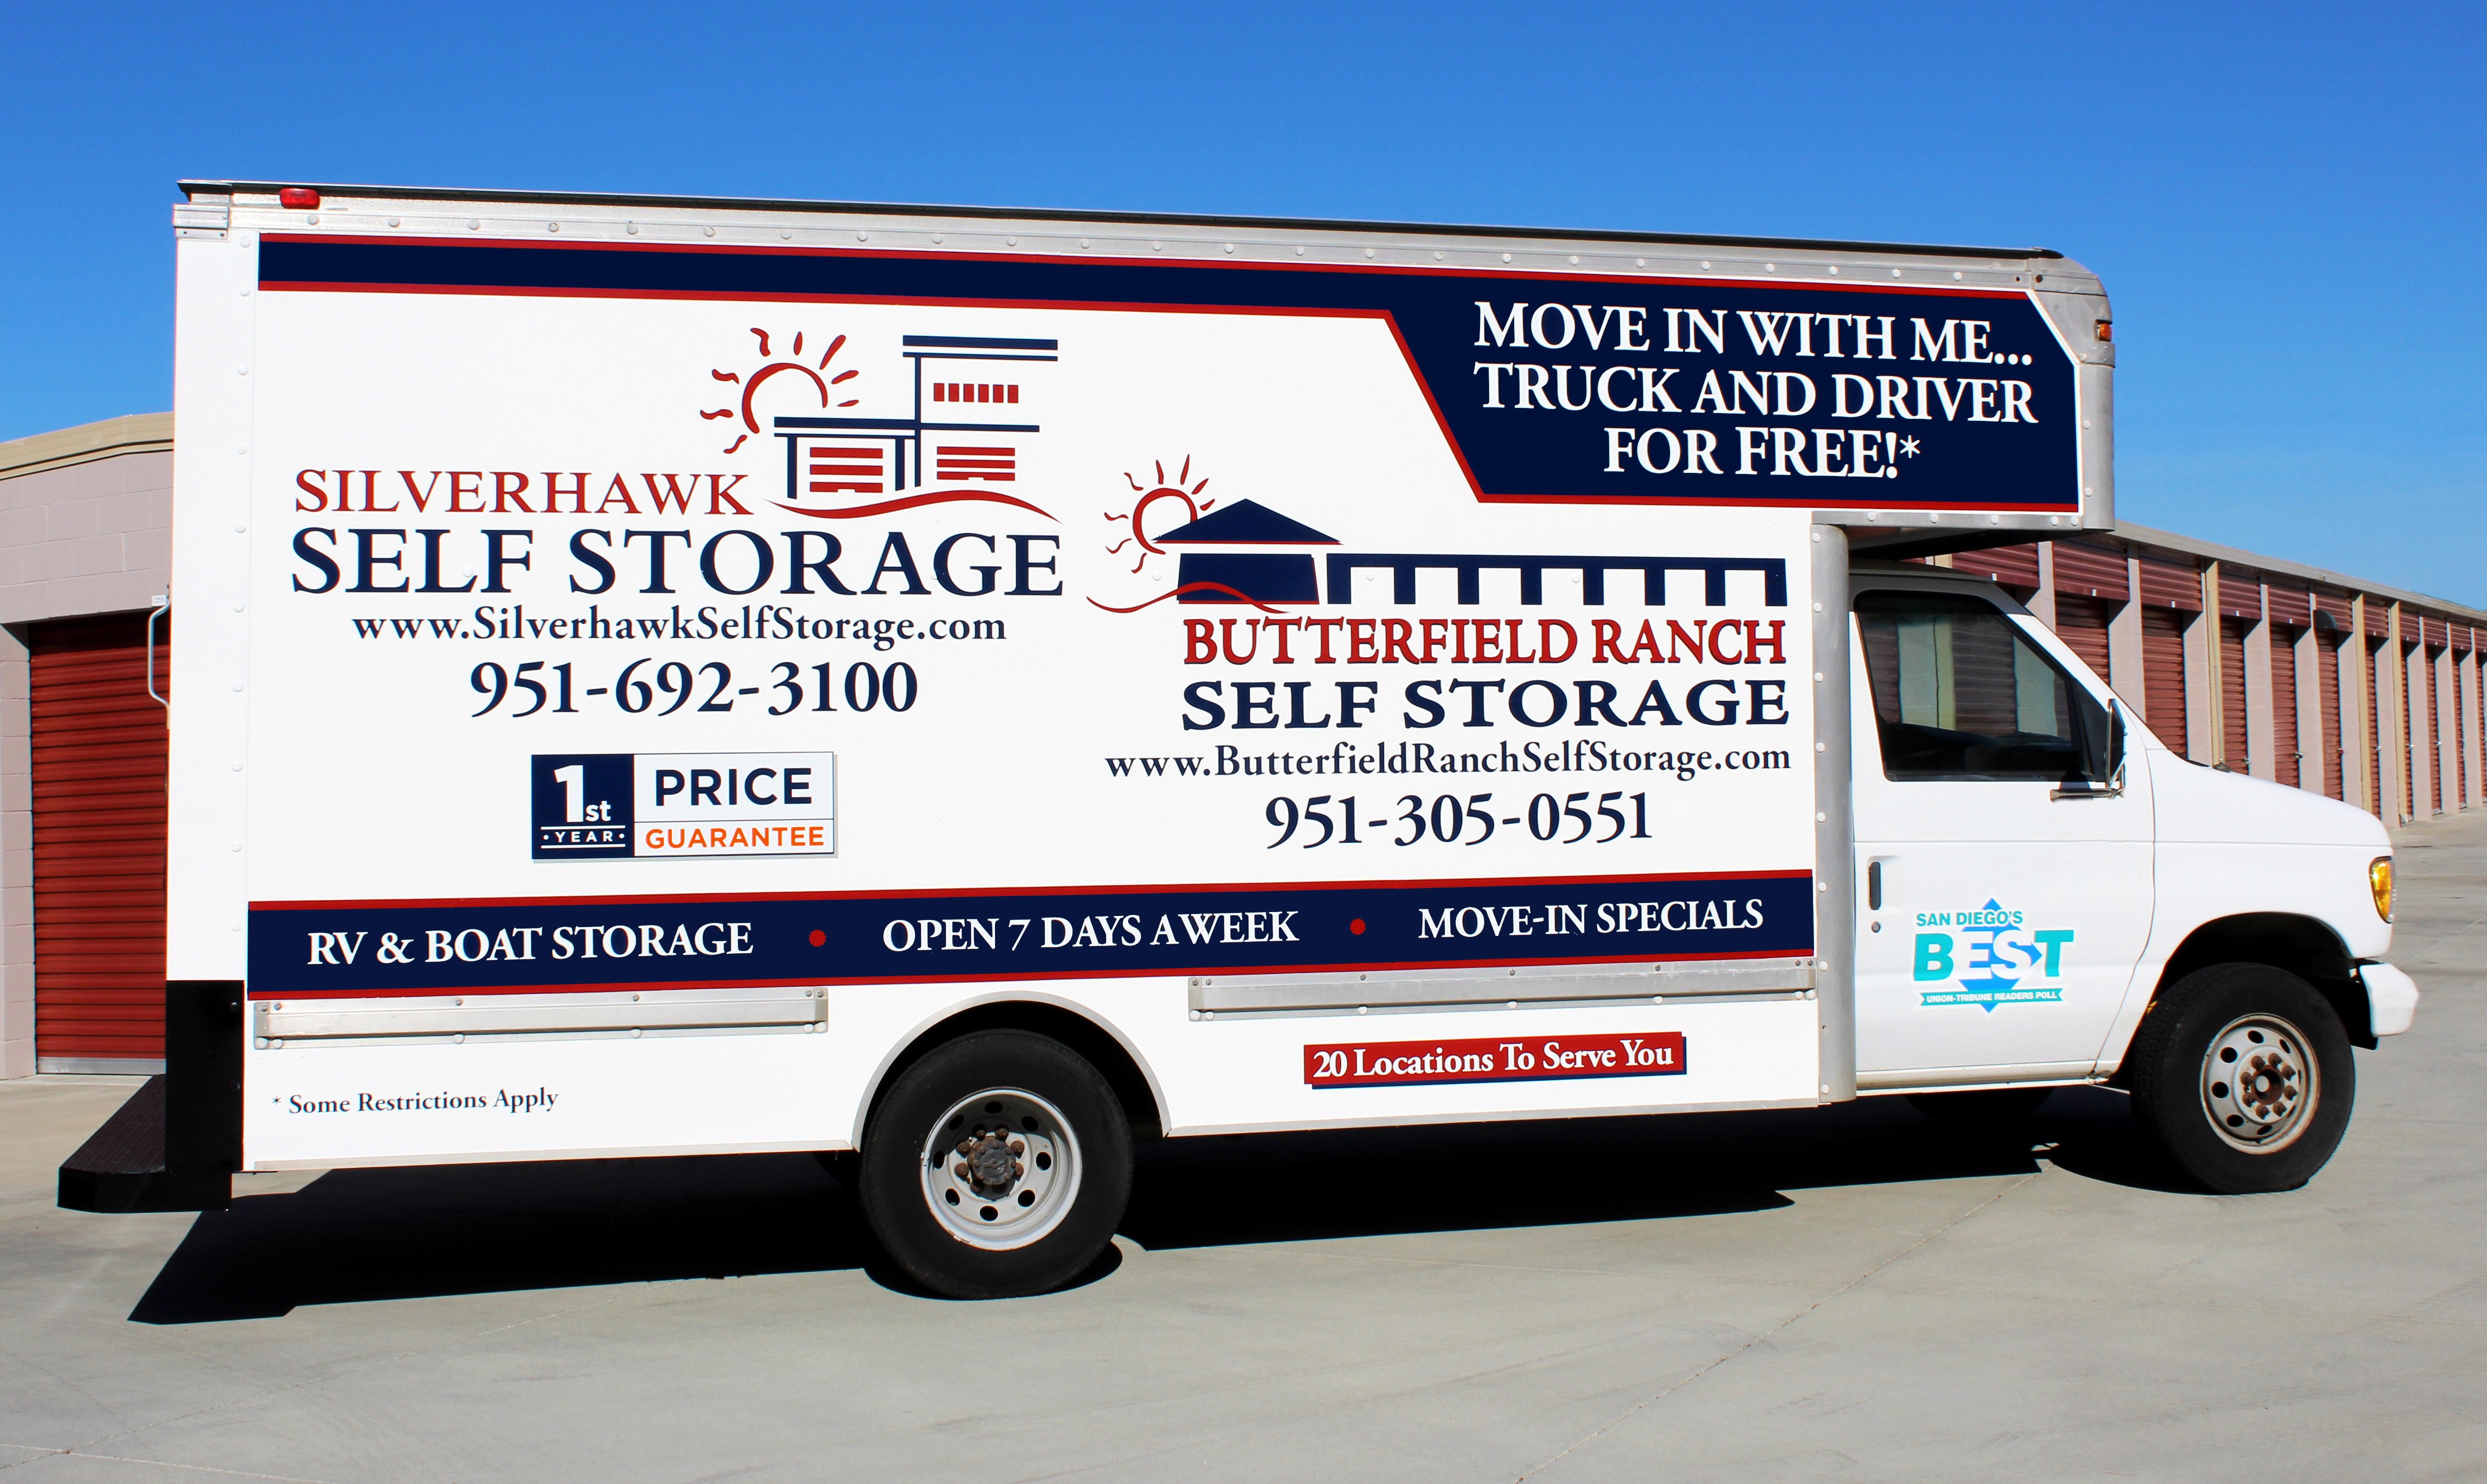 Butterfield Ranch Self Storage